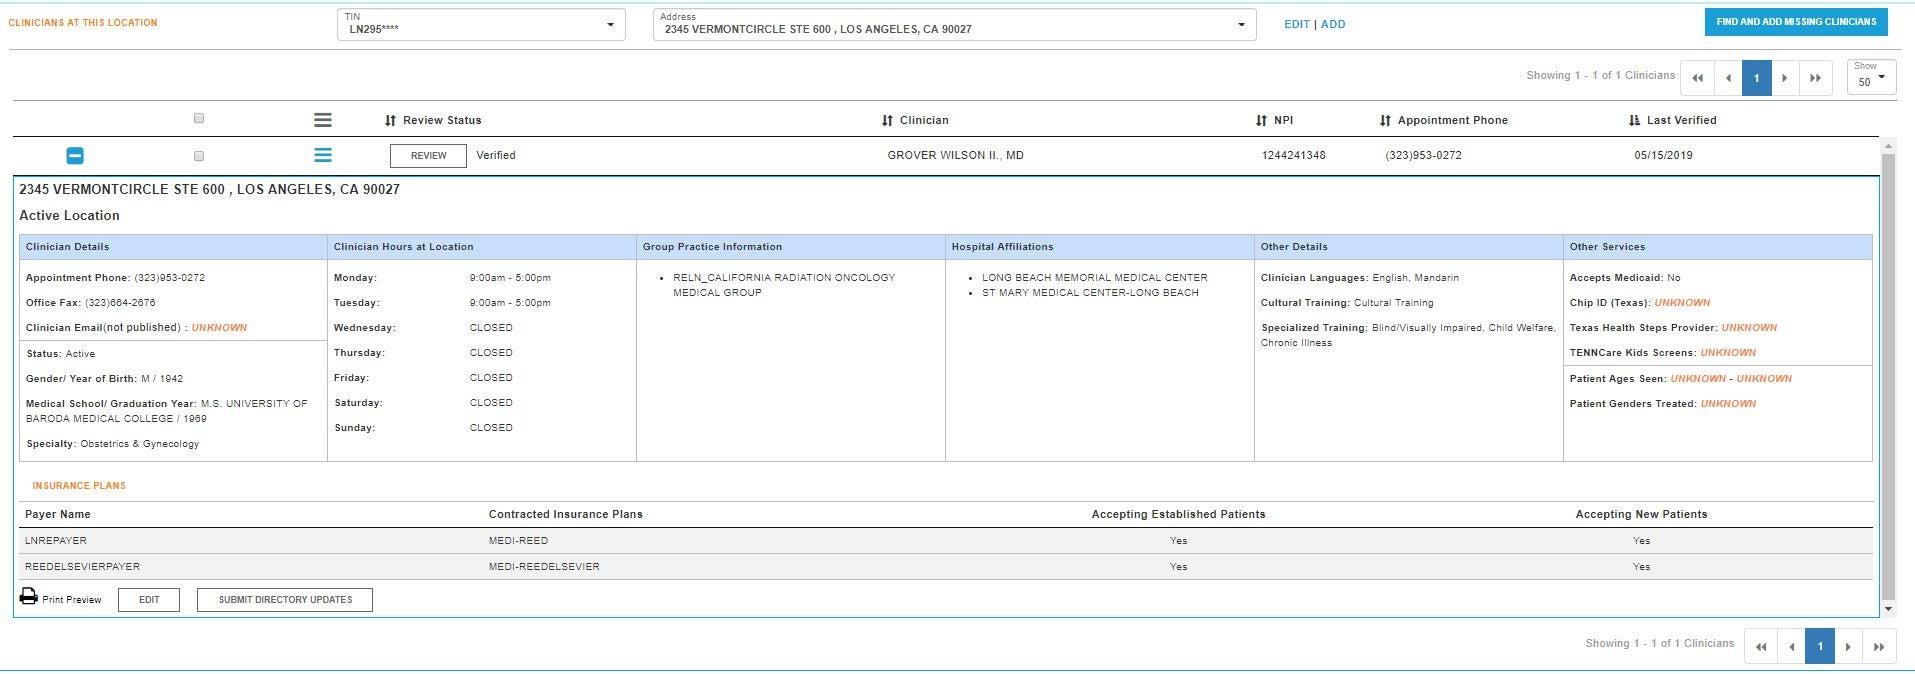 VerifyHCP® | LexisNexis Risk Solutions